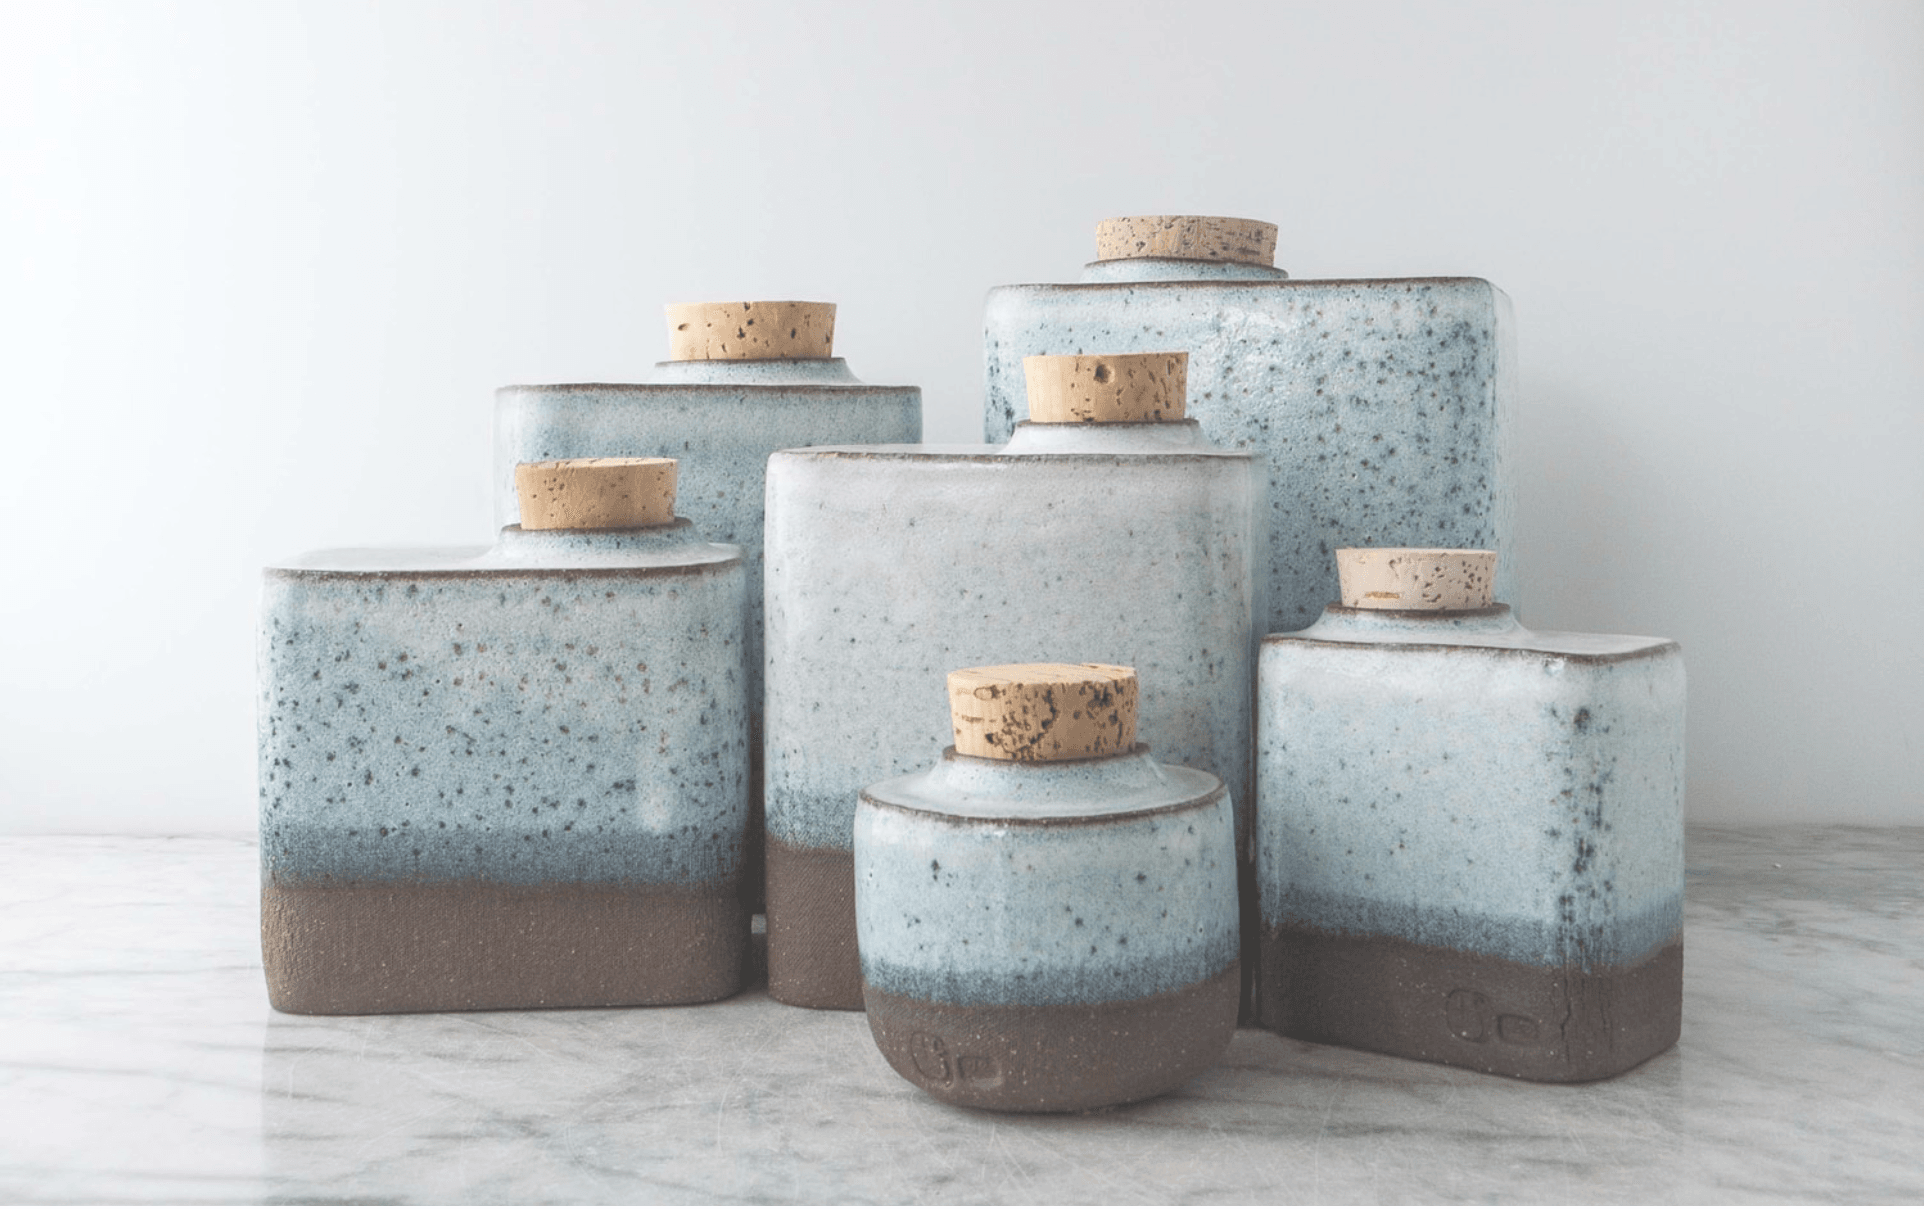 Elegant handmade resting vessels